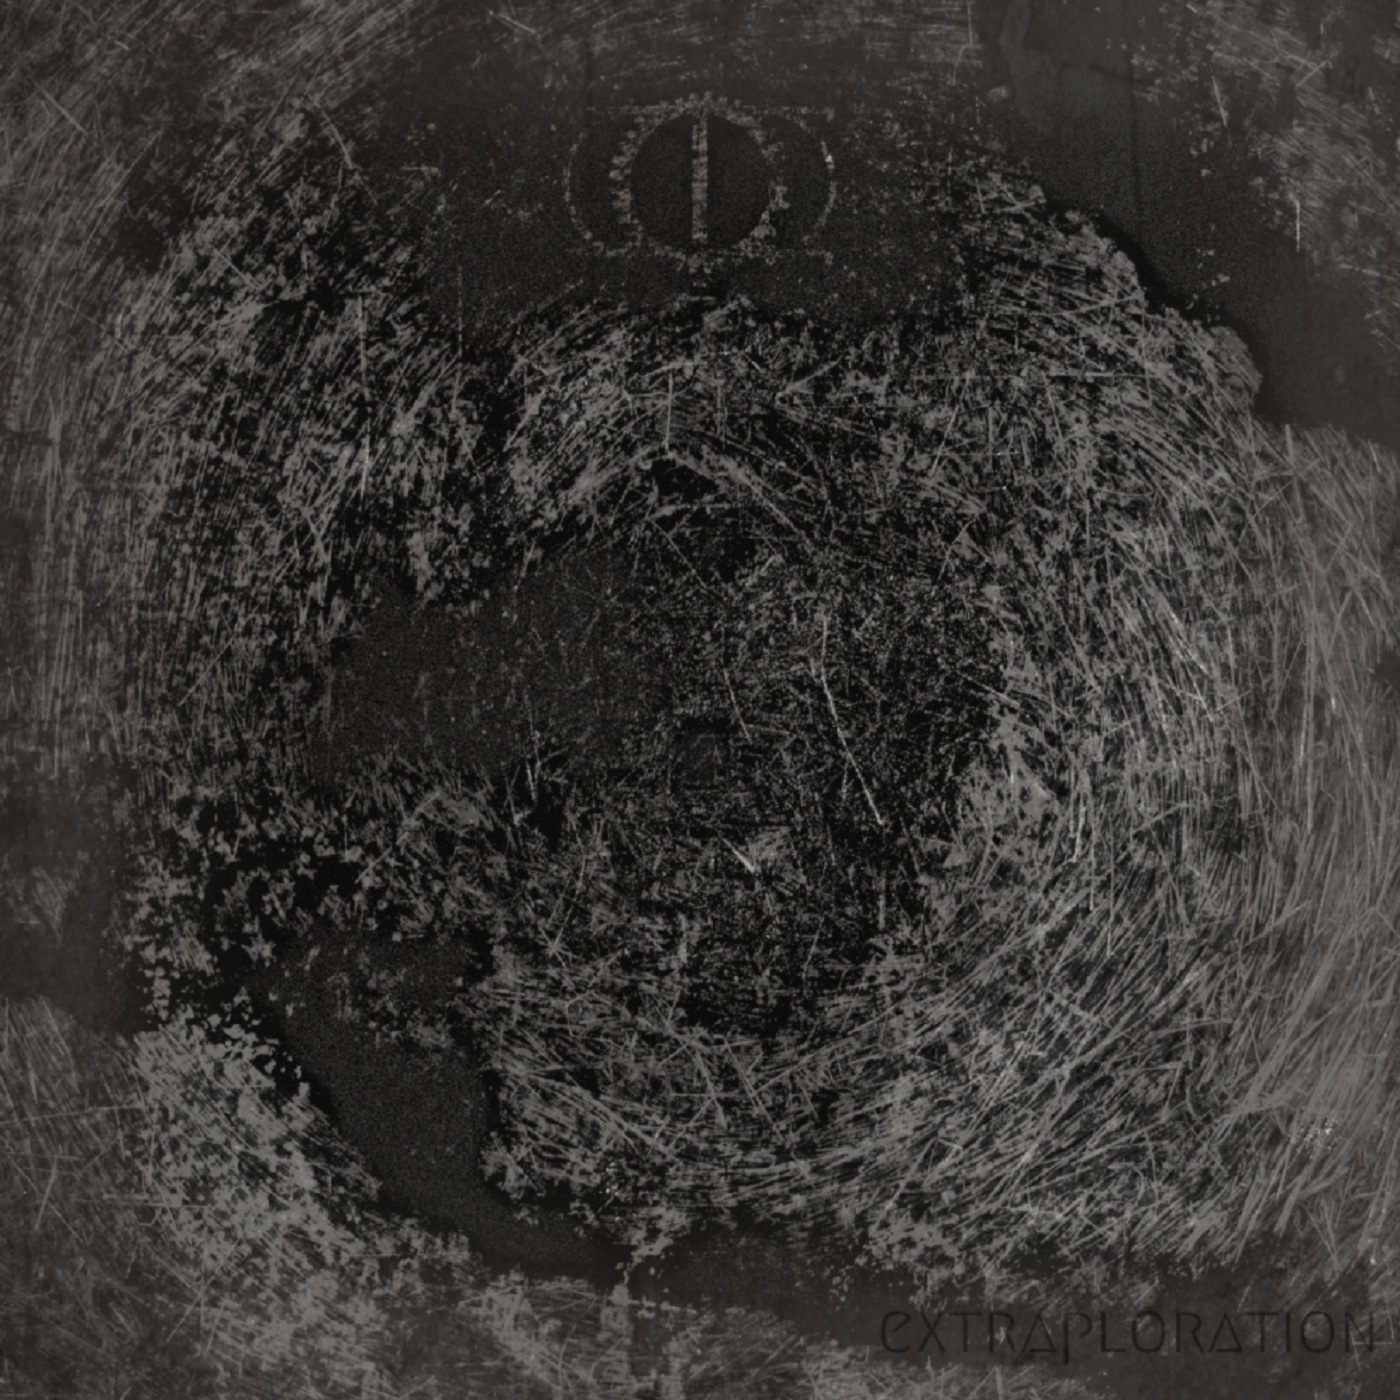 ardleg – extraploration